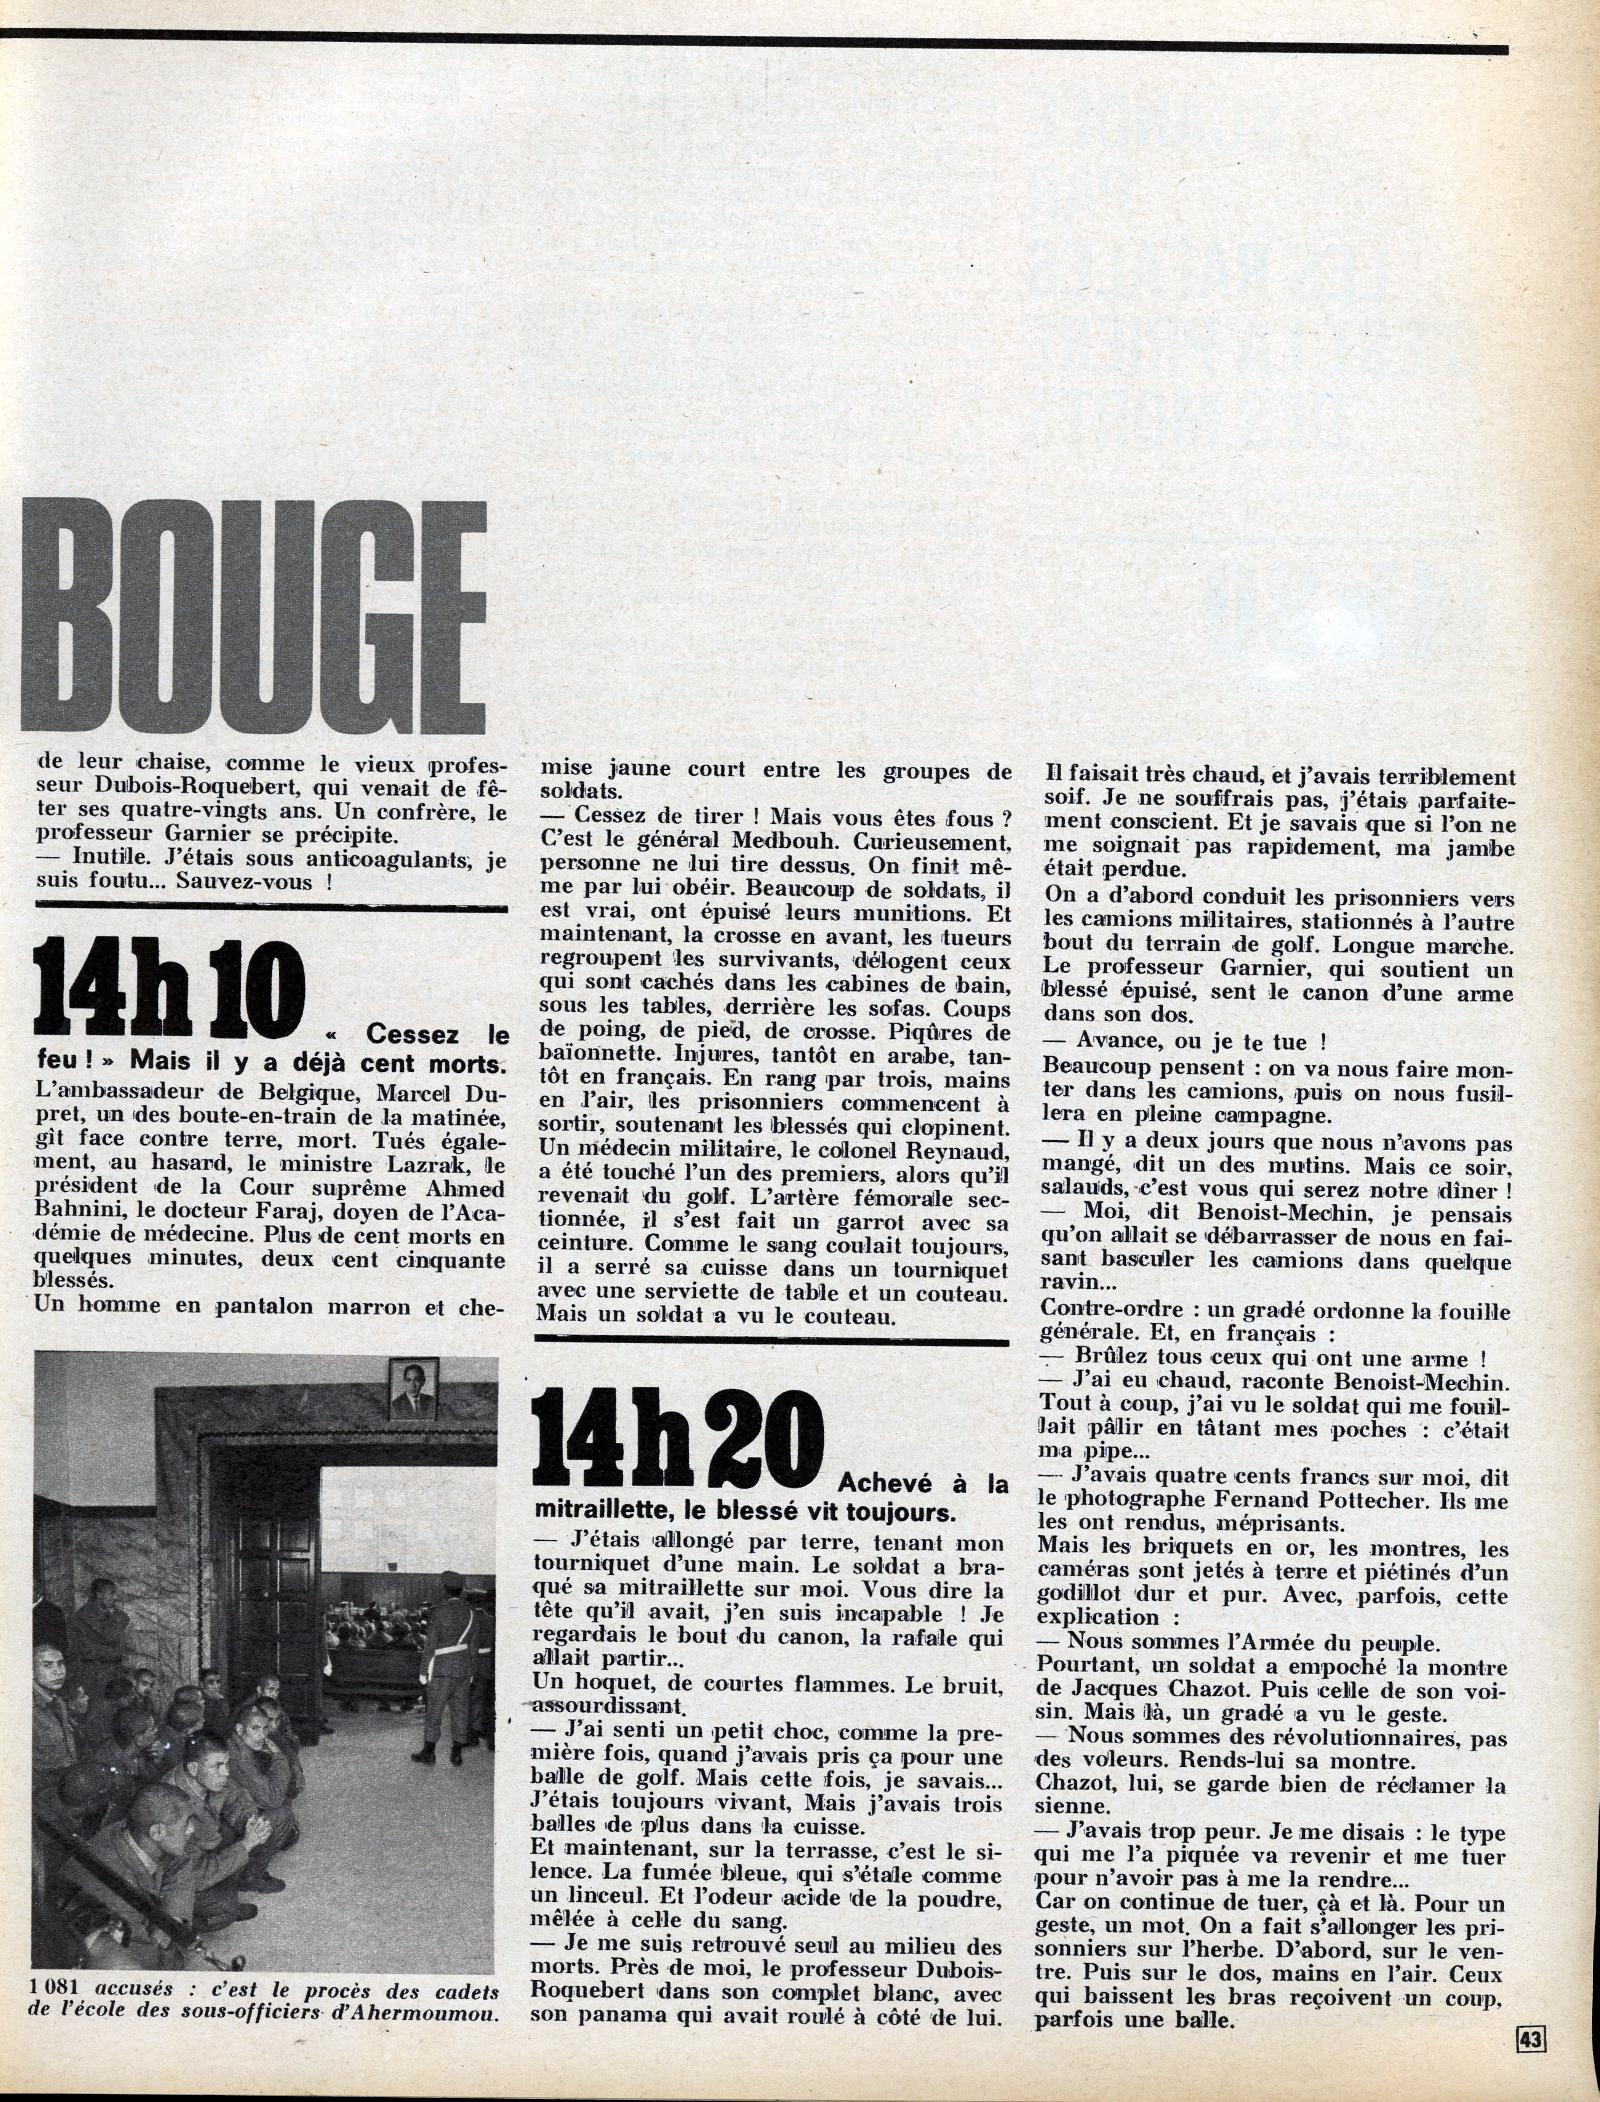 Tentative de coup d'État à Rabat et Skhirate le 10 juillet 1971  48695325063_dfc82f7036_o